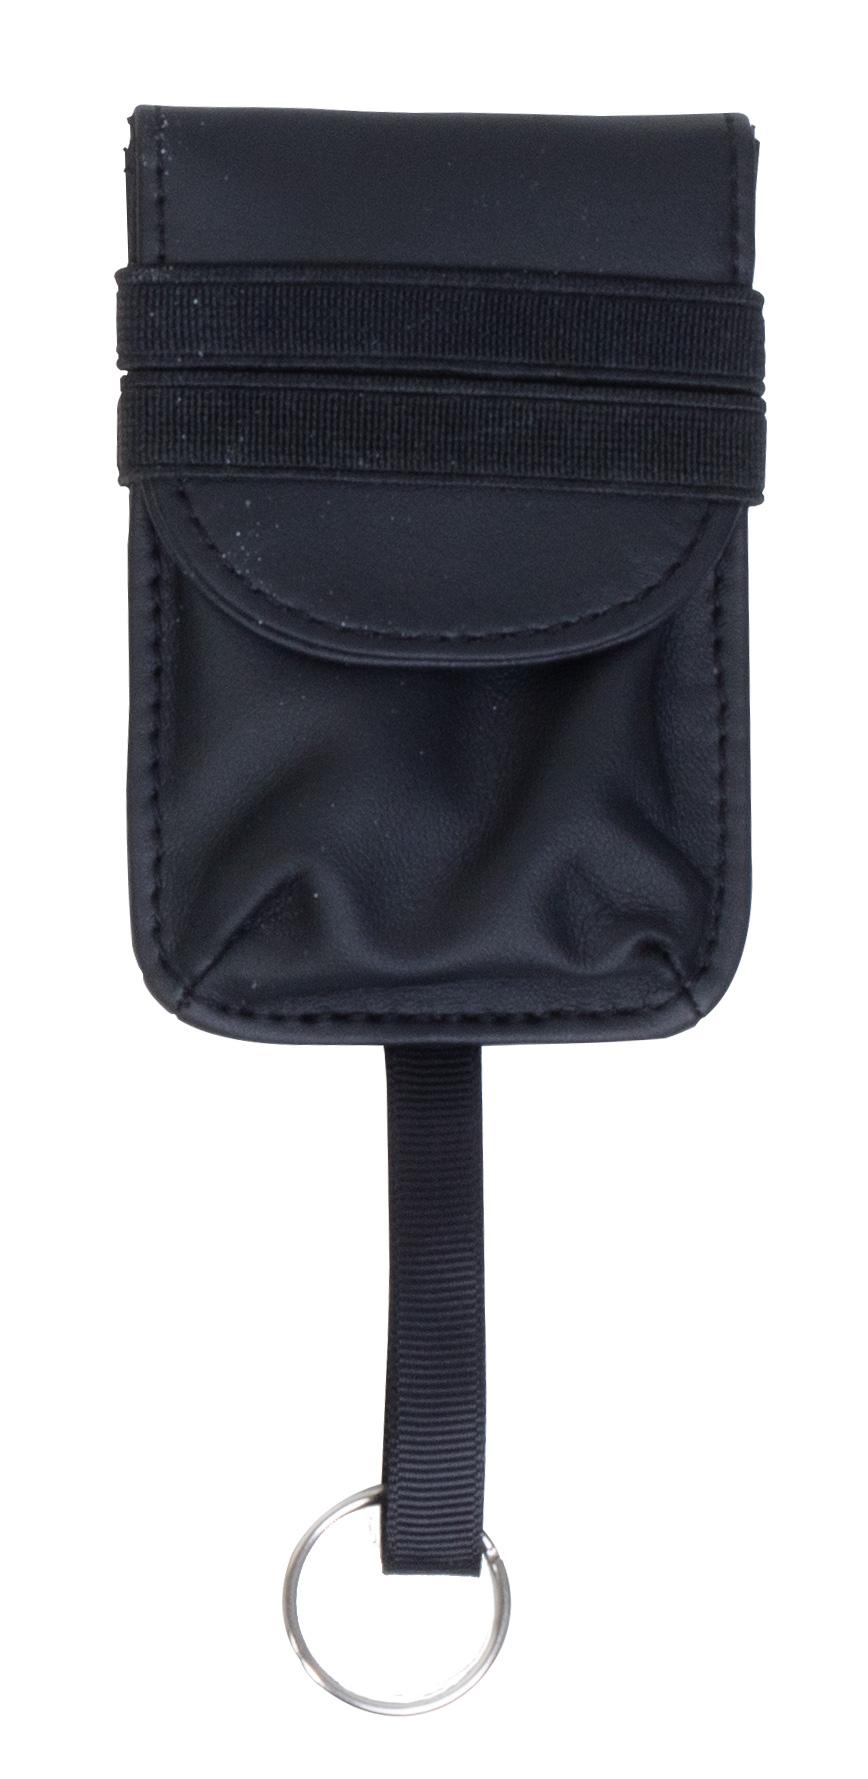 589754f64f46 Details about WRAPS RFID Signal Block Security Anti-Theft Travel Wallet  Strap Belt Bag Keyring